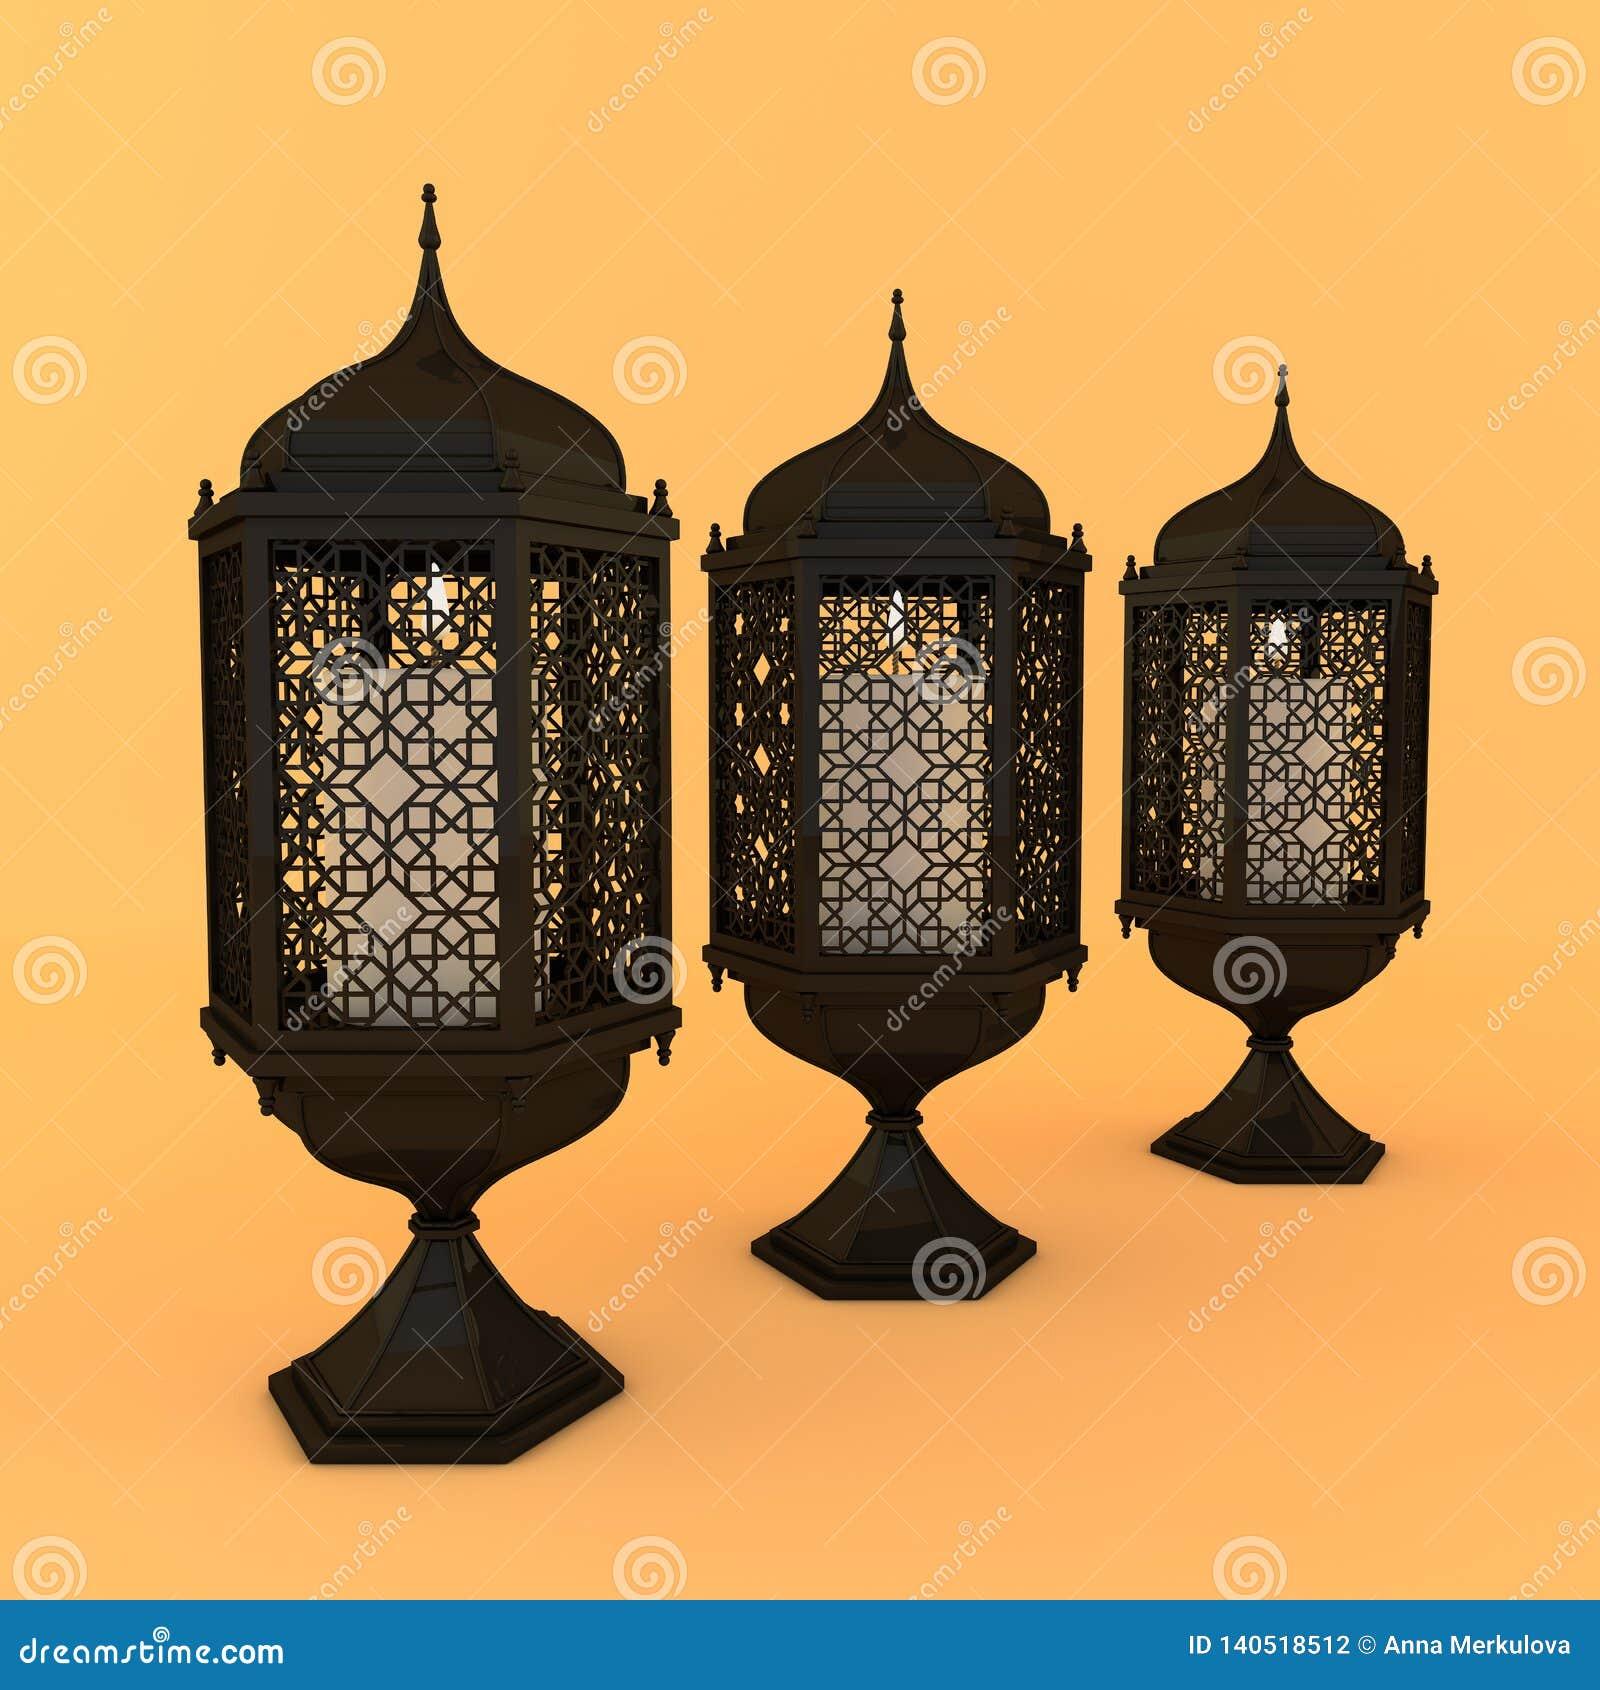 Black lantern with candle, lamp with arabic decoration, arabesque design. Concept for islamic celebration day ramadan kareem or